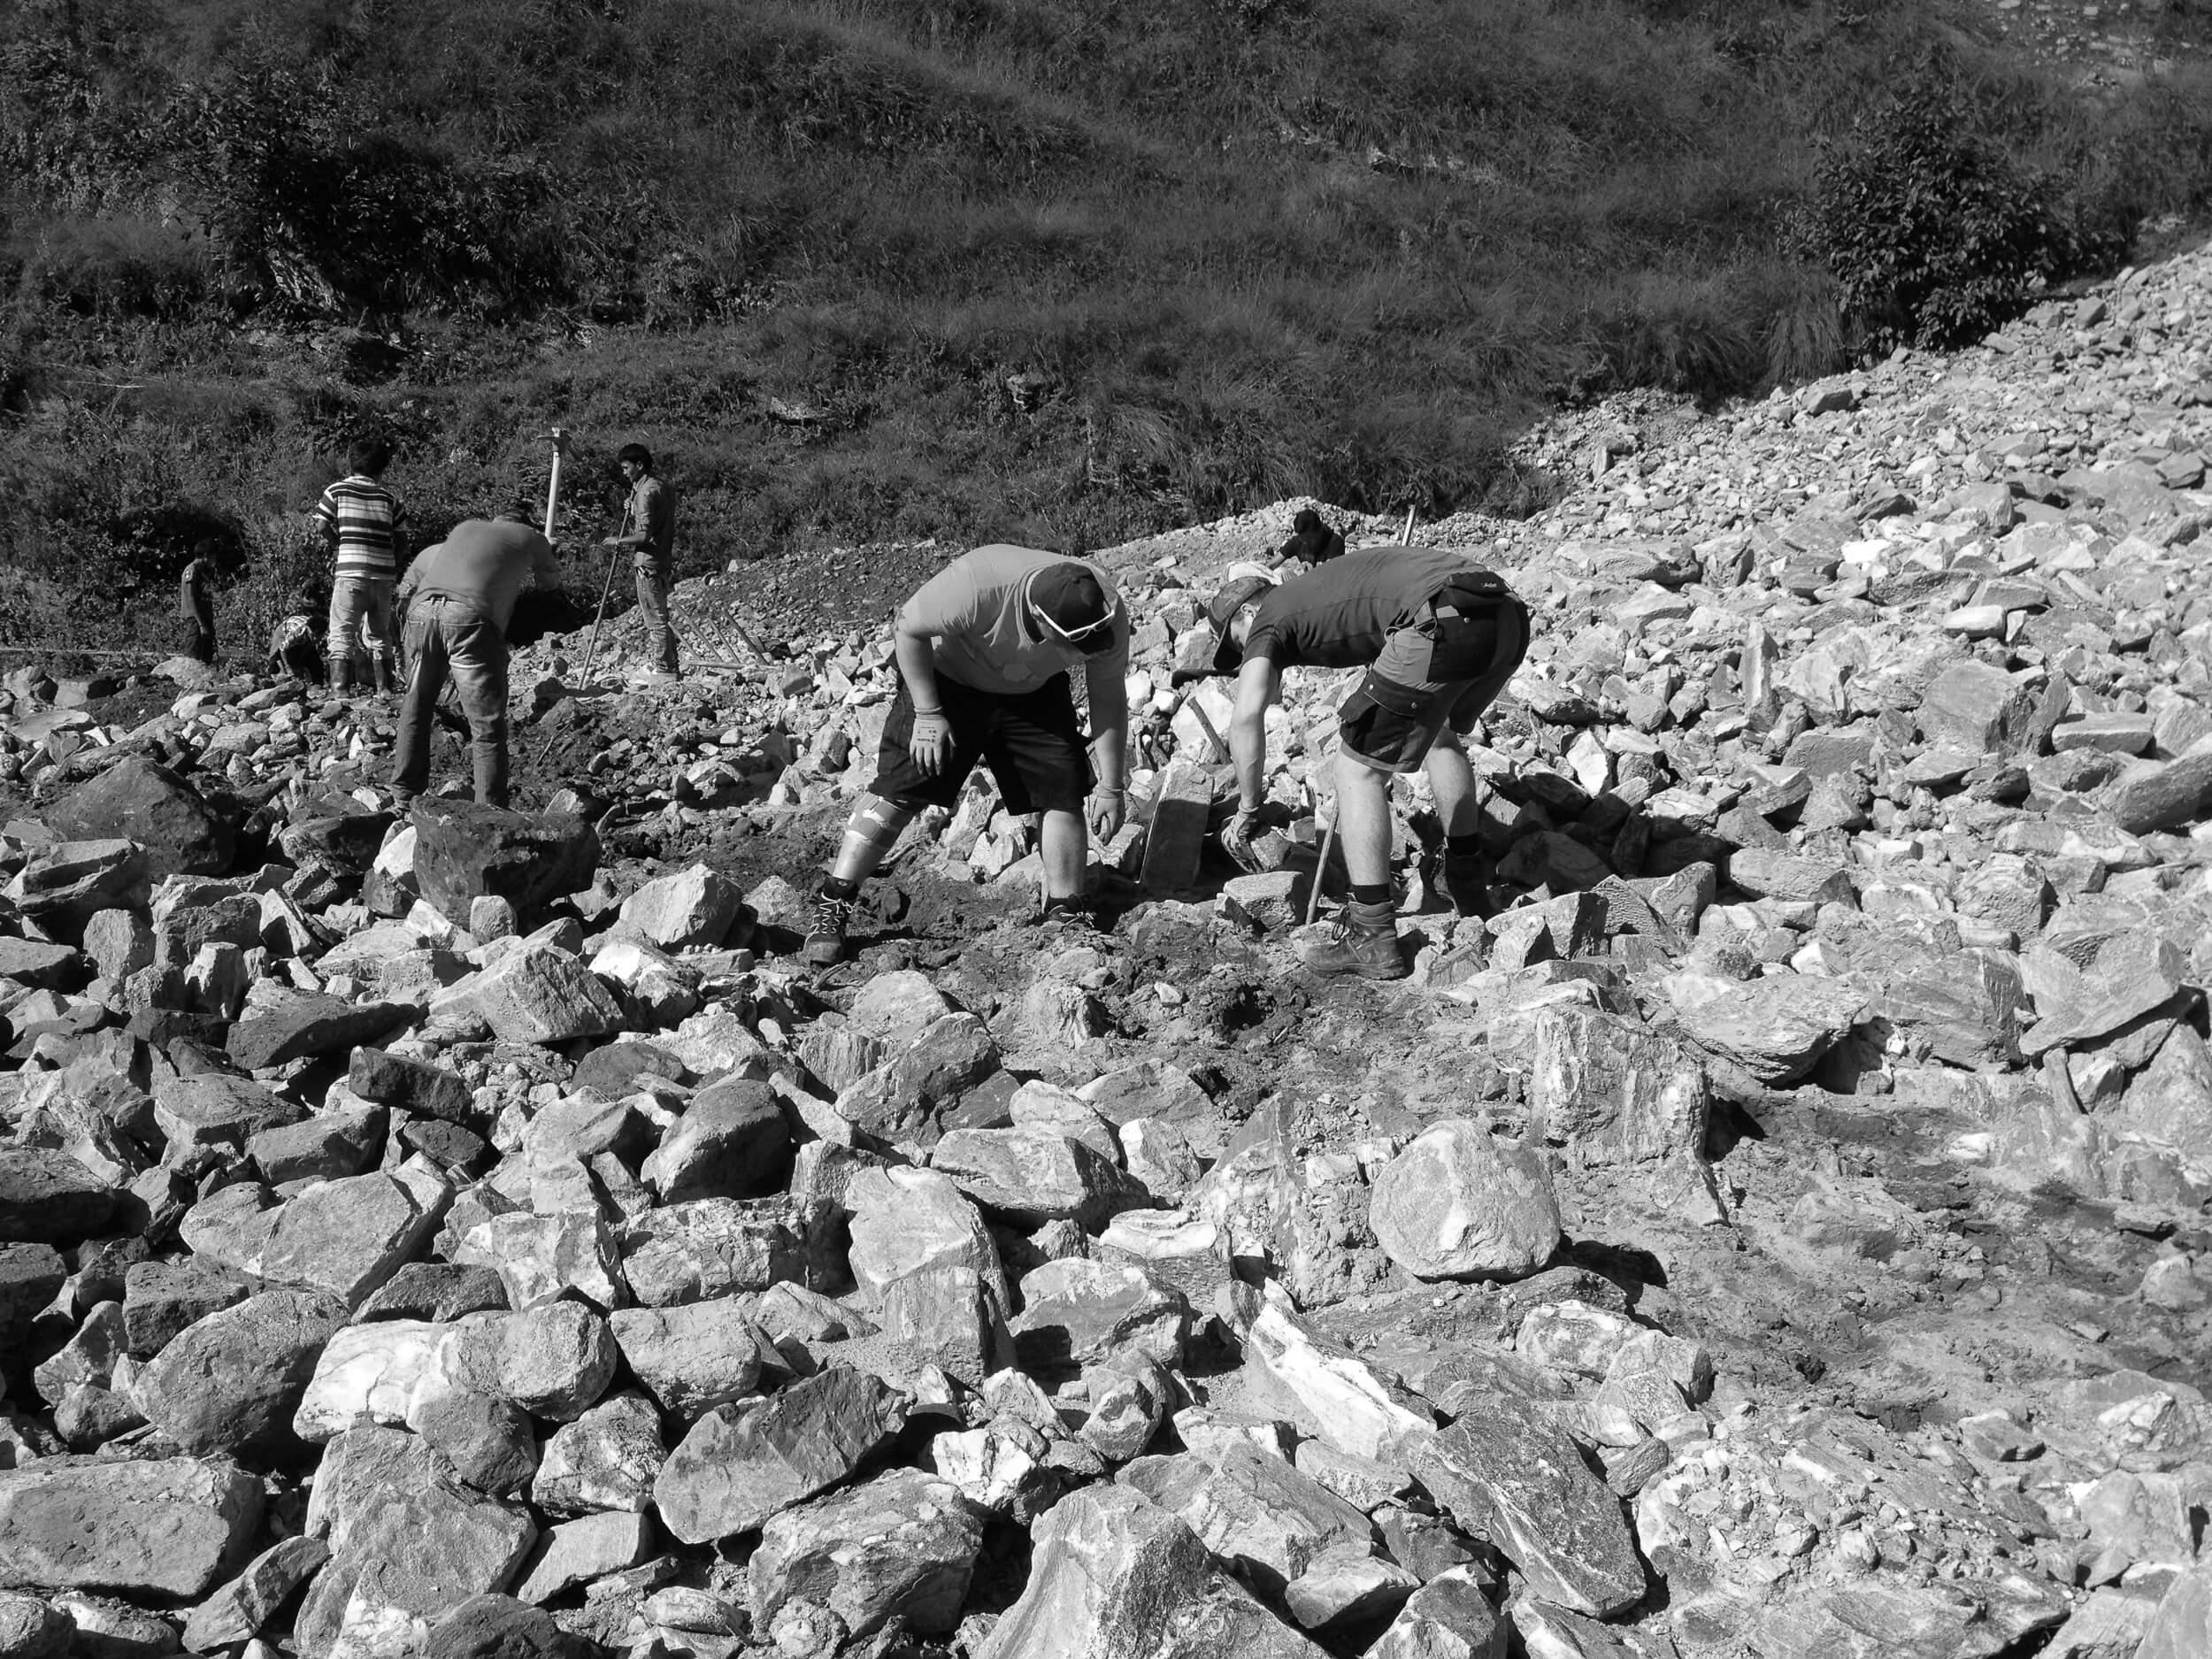 nepal_daniels-fotos_IMG_6404_sw.jpg